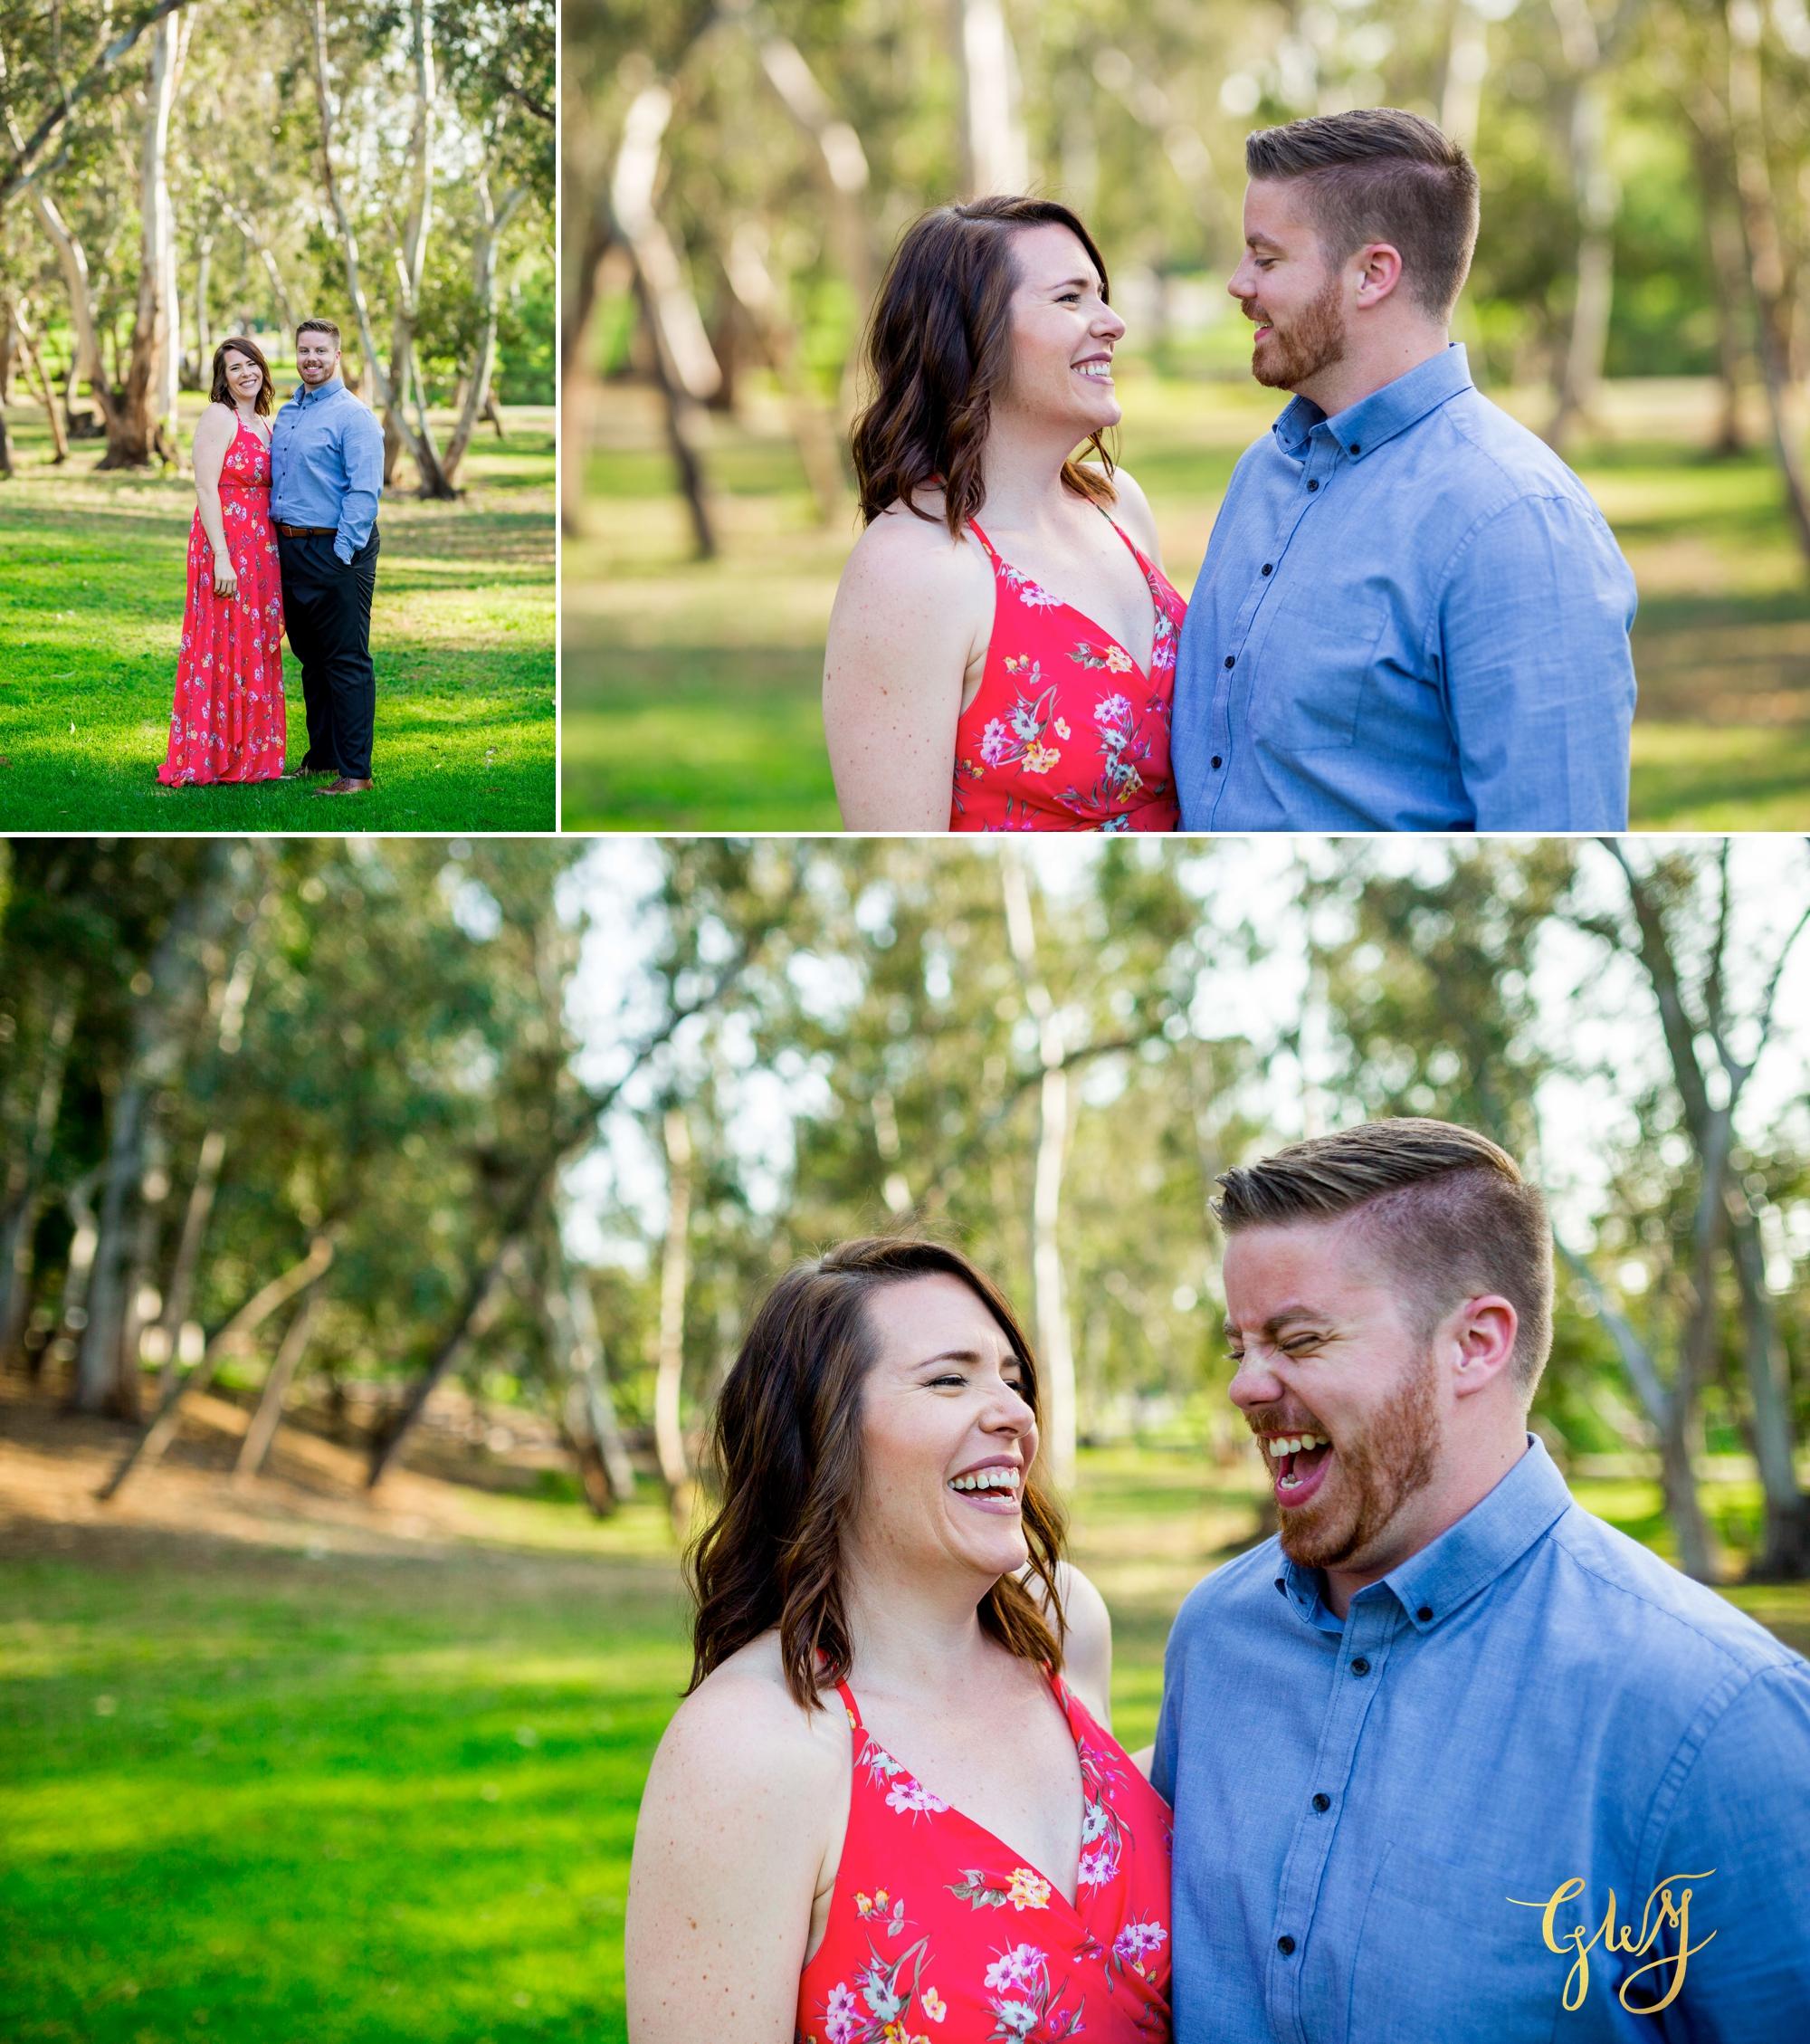 Cristina + David's Huntington Beach Central Park Romantic Sunset Engagement Session by Glass Woods Media 1.jpg